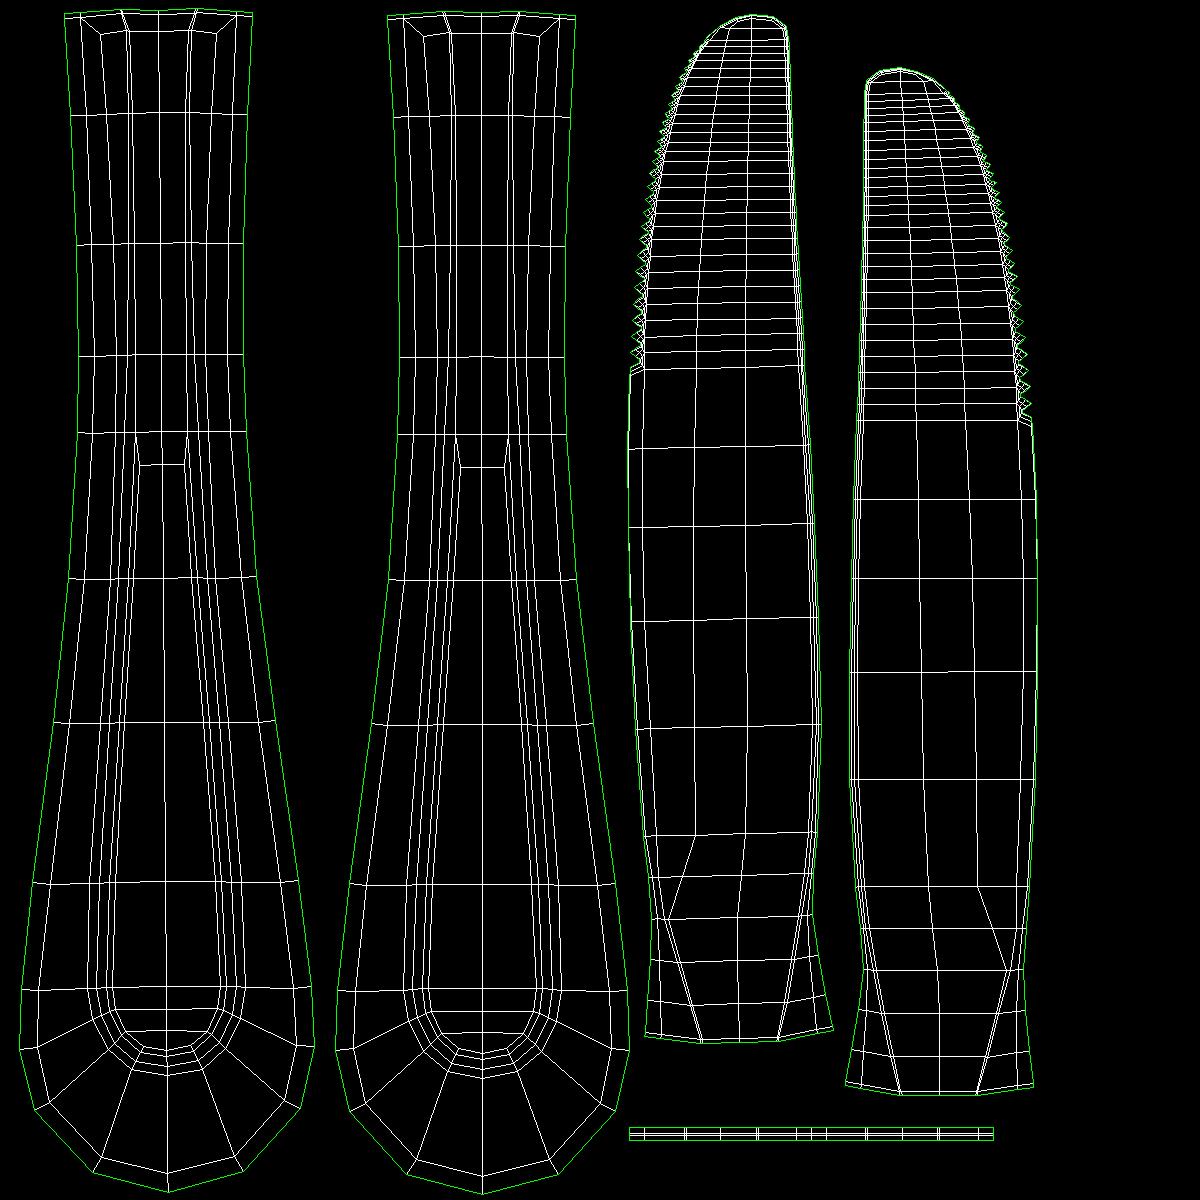 desertni nož klasični pribor 3d model 3ds c4d stl txt png fbx max max ma mb obj 285256